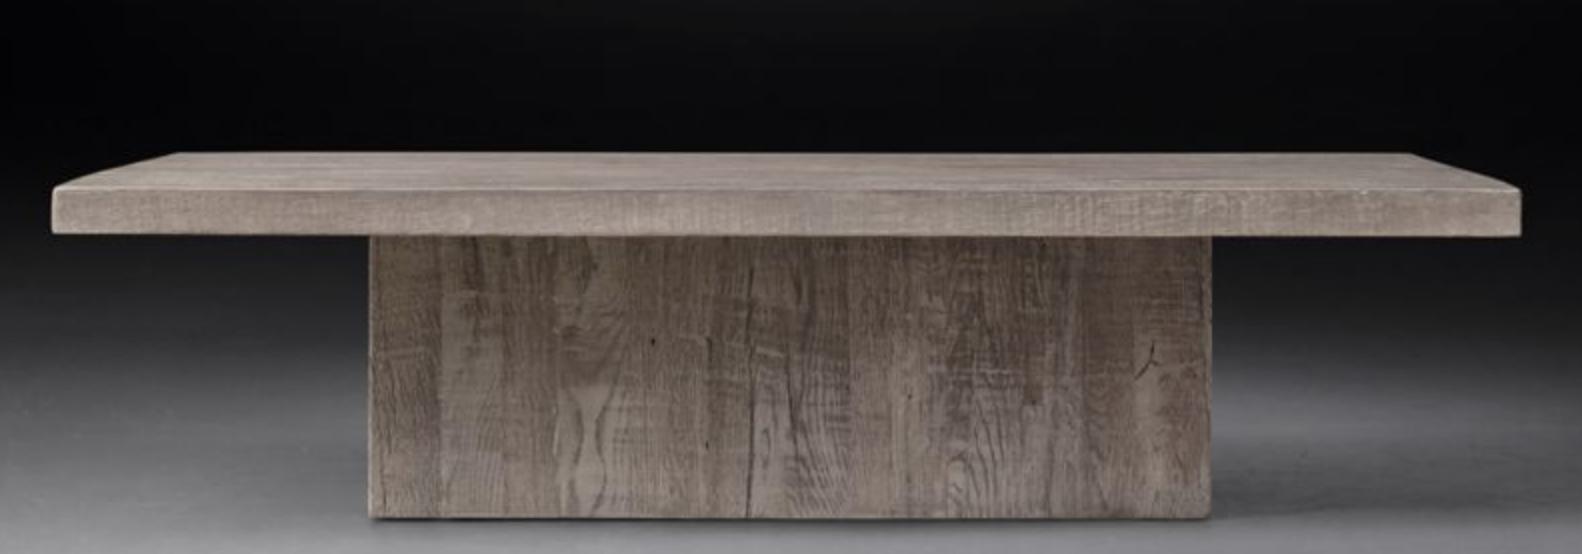 Sizes 55 W X 32 D X 14 H 183 Lbs 68 W X 43 D X 15 H 249 Lbs 80 W X 50 D X 14 H 220 Lbs Material Reclaimed Grey Ru Oak Grey Oak Coffee Table